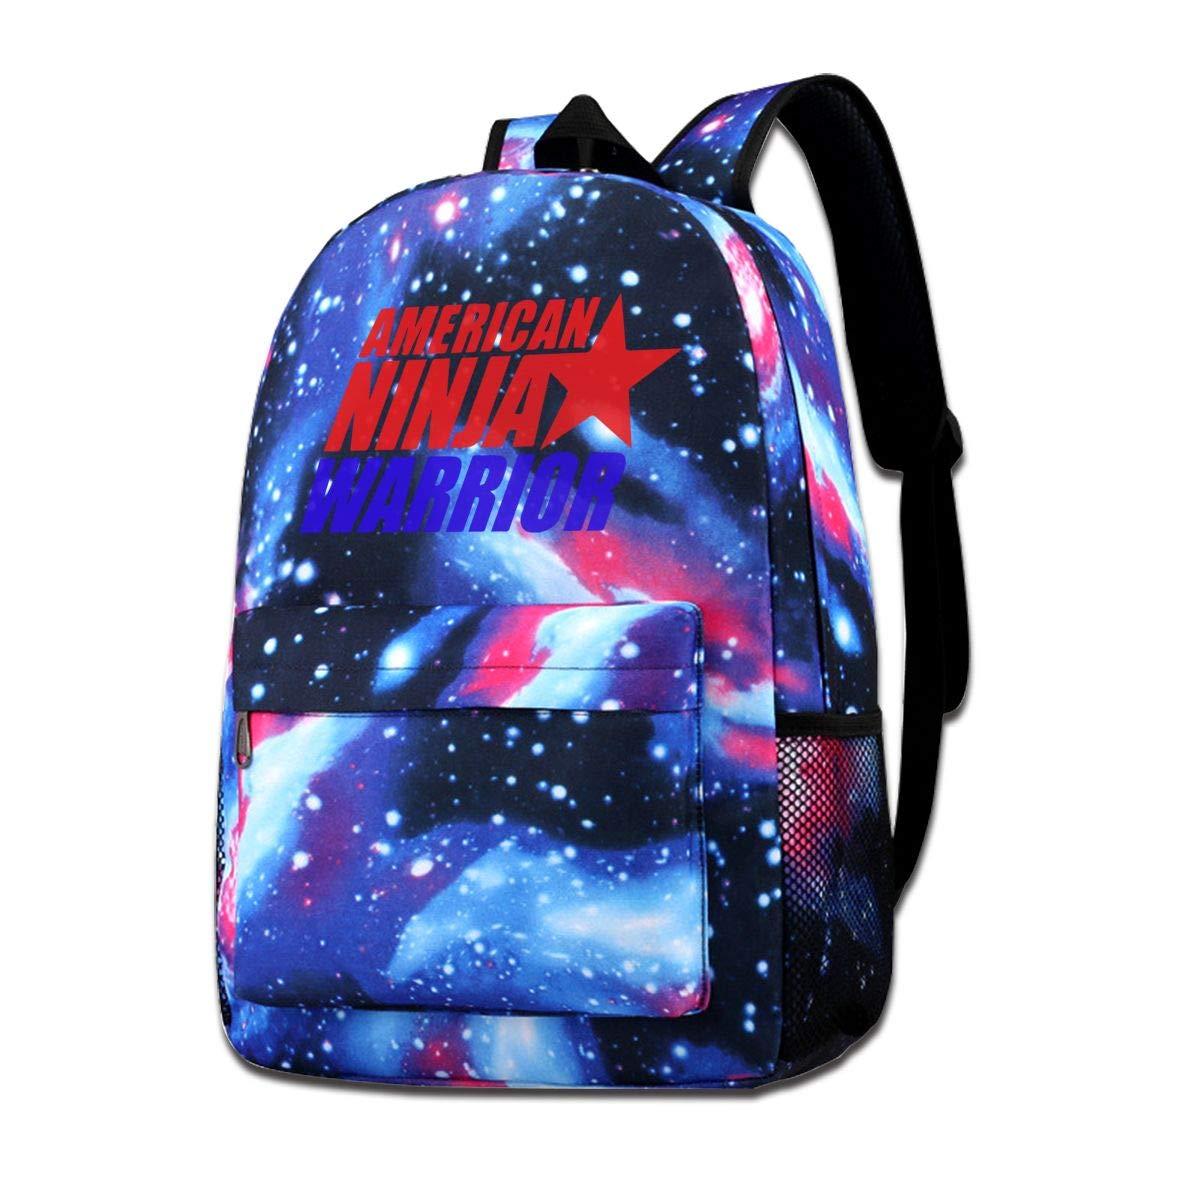 Amazon.com: American-Ninja Warrior Galaxy Shoulder Bag ...